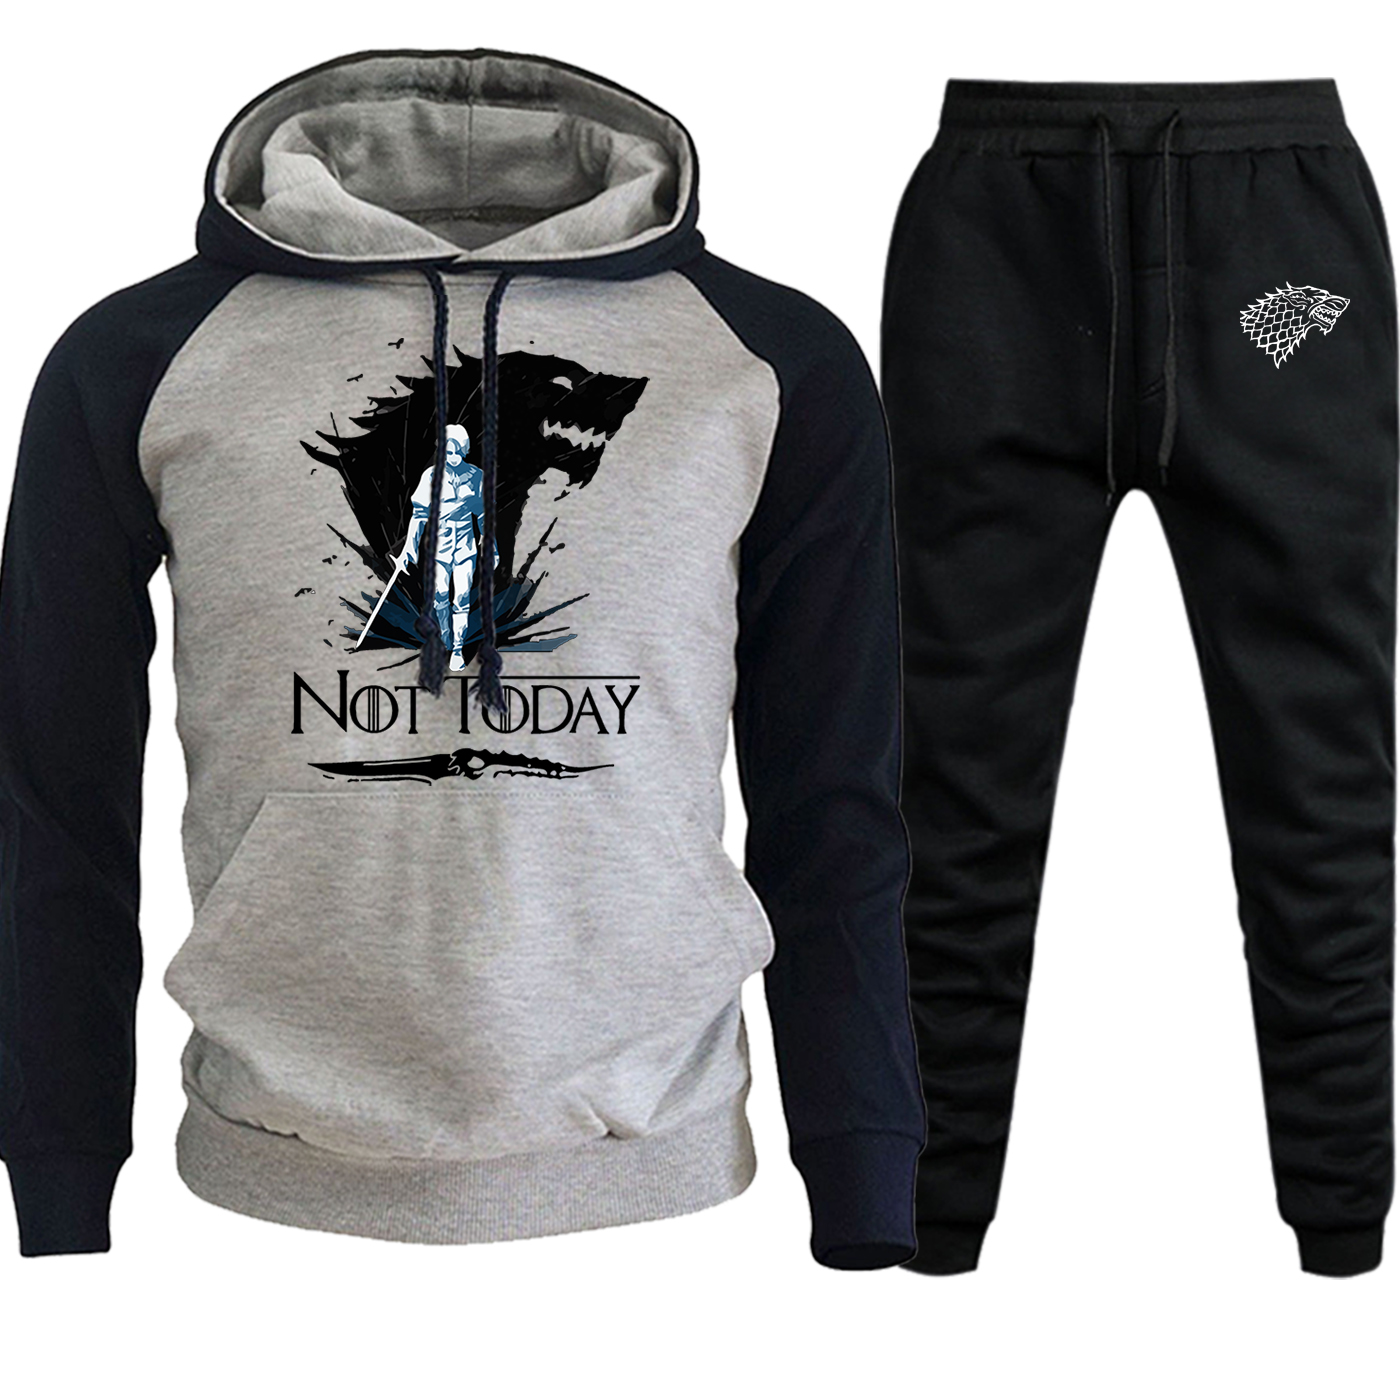 Not Today Game Of Thrones Arya Stark Autumn Winter 2019 Streetwear Raglan Men Hooded Suit Casual Pollover+Sweatpants 2 Piece Set